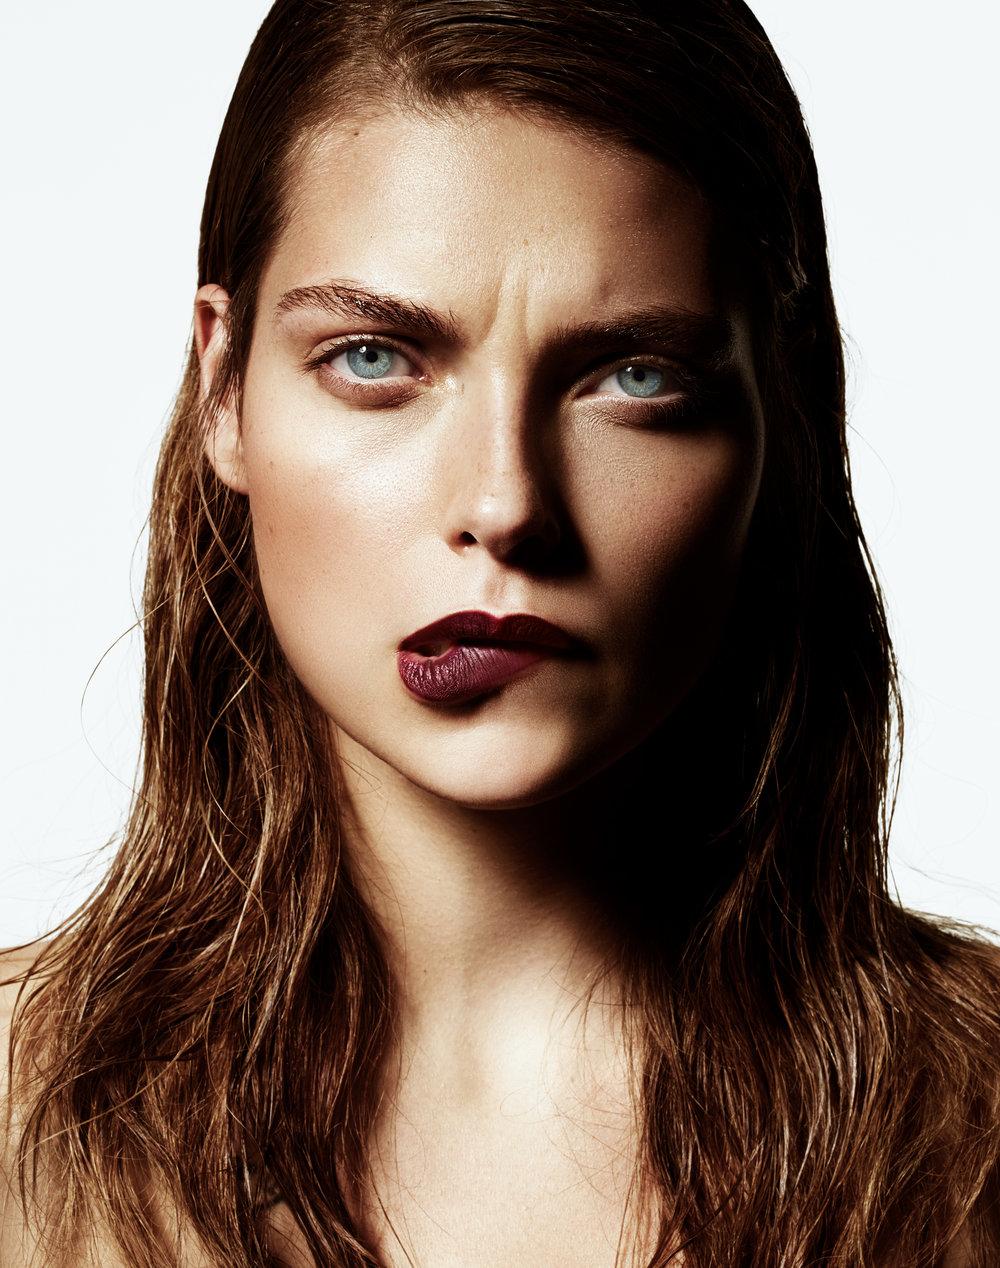 Anna Dabrowska beauty 053.jpg